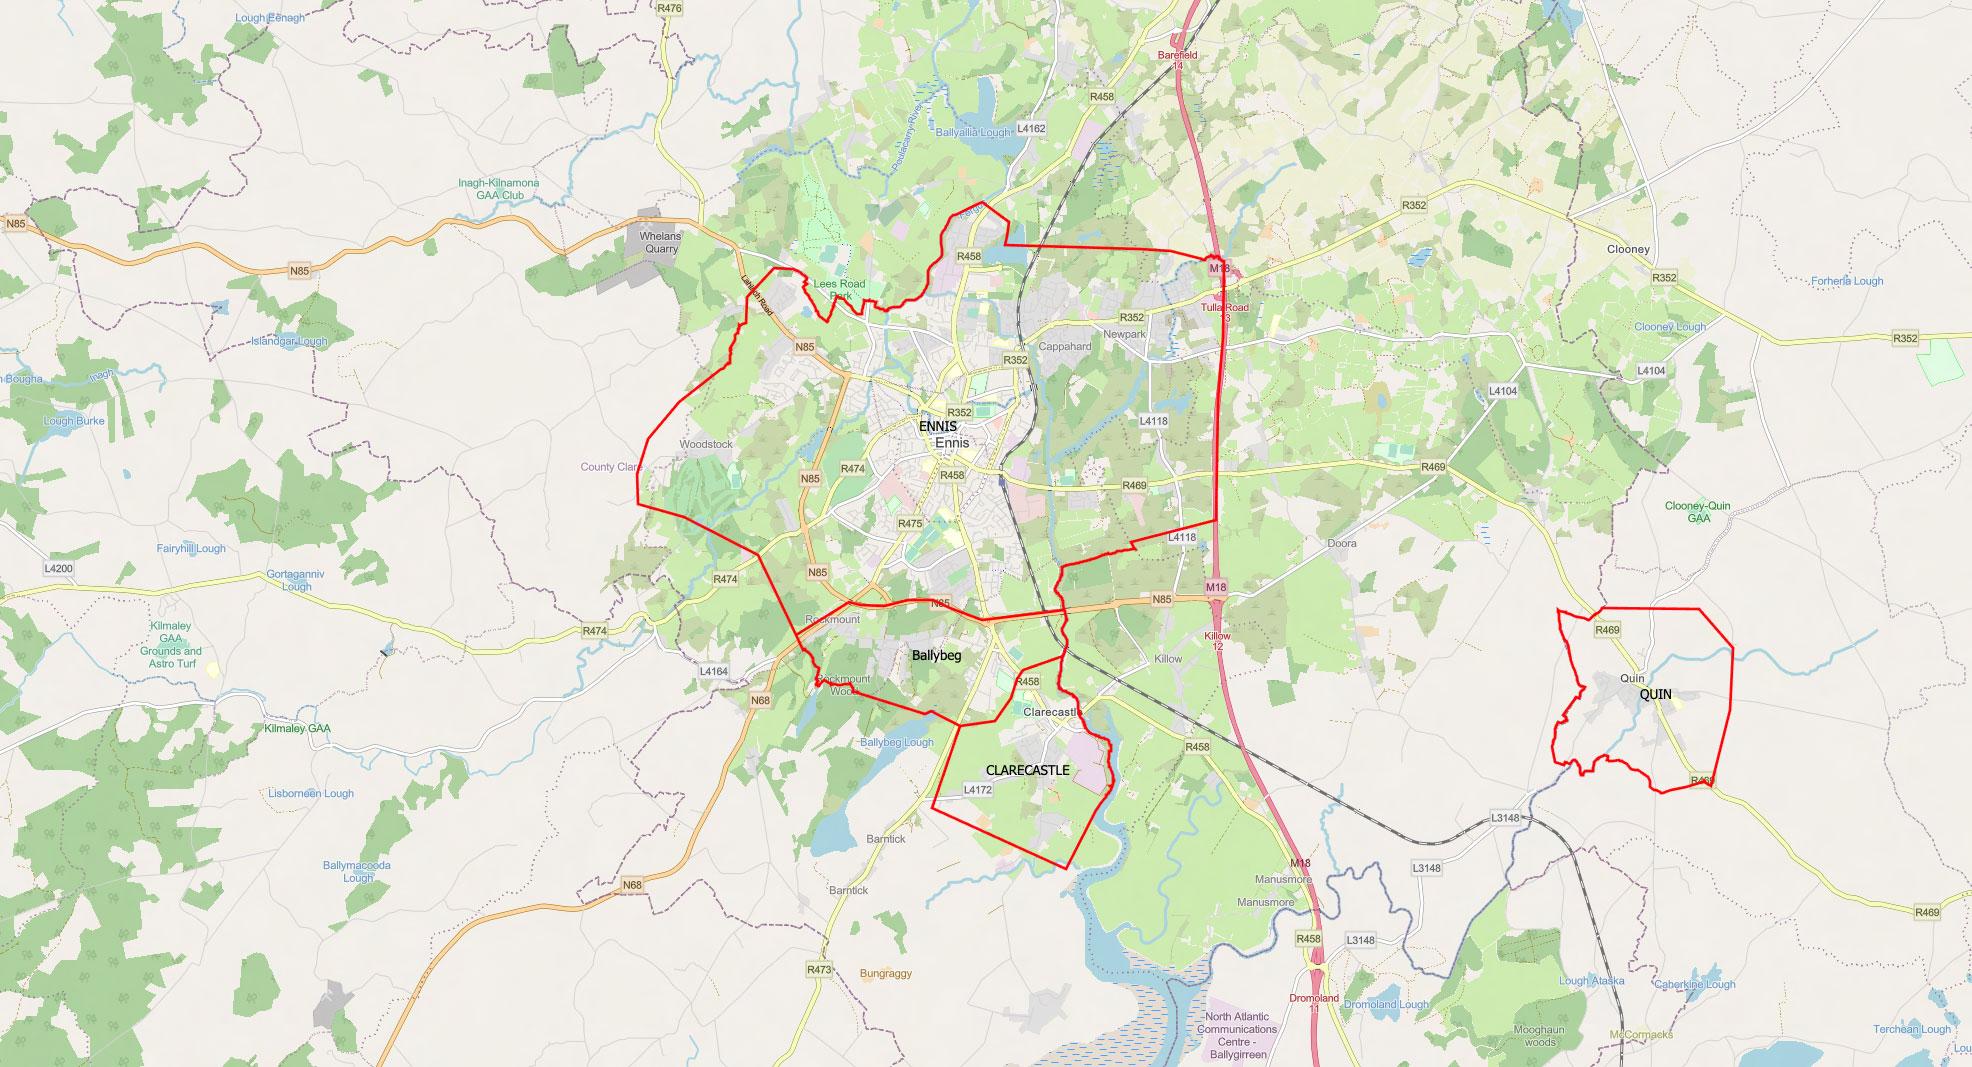 solar-panels-ennis-clare-ireland-map-img